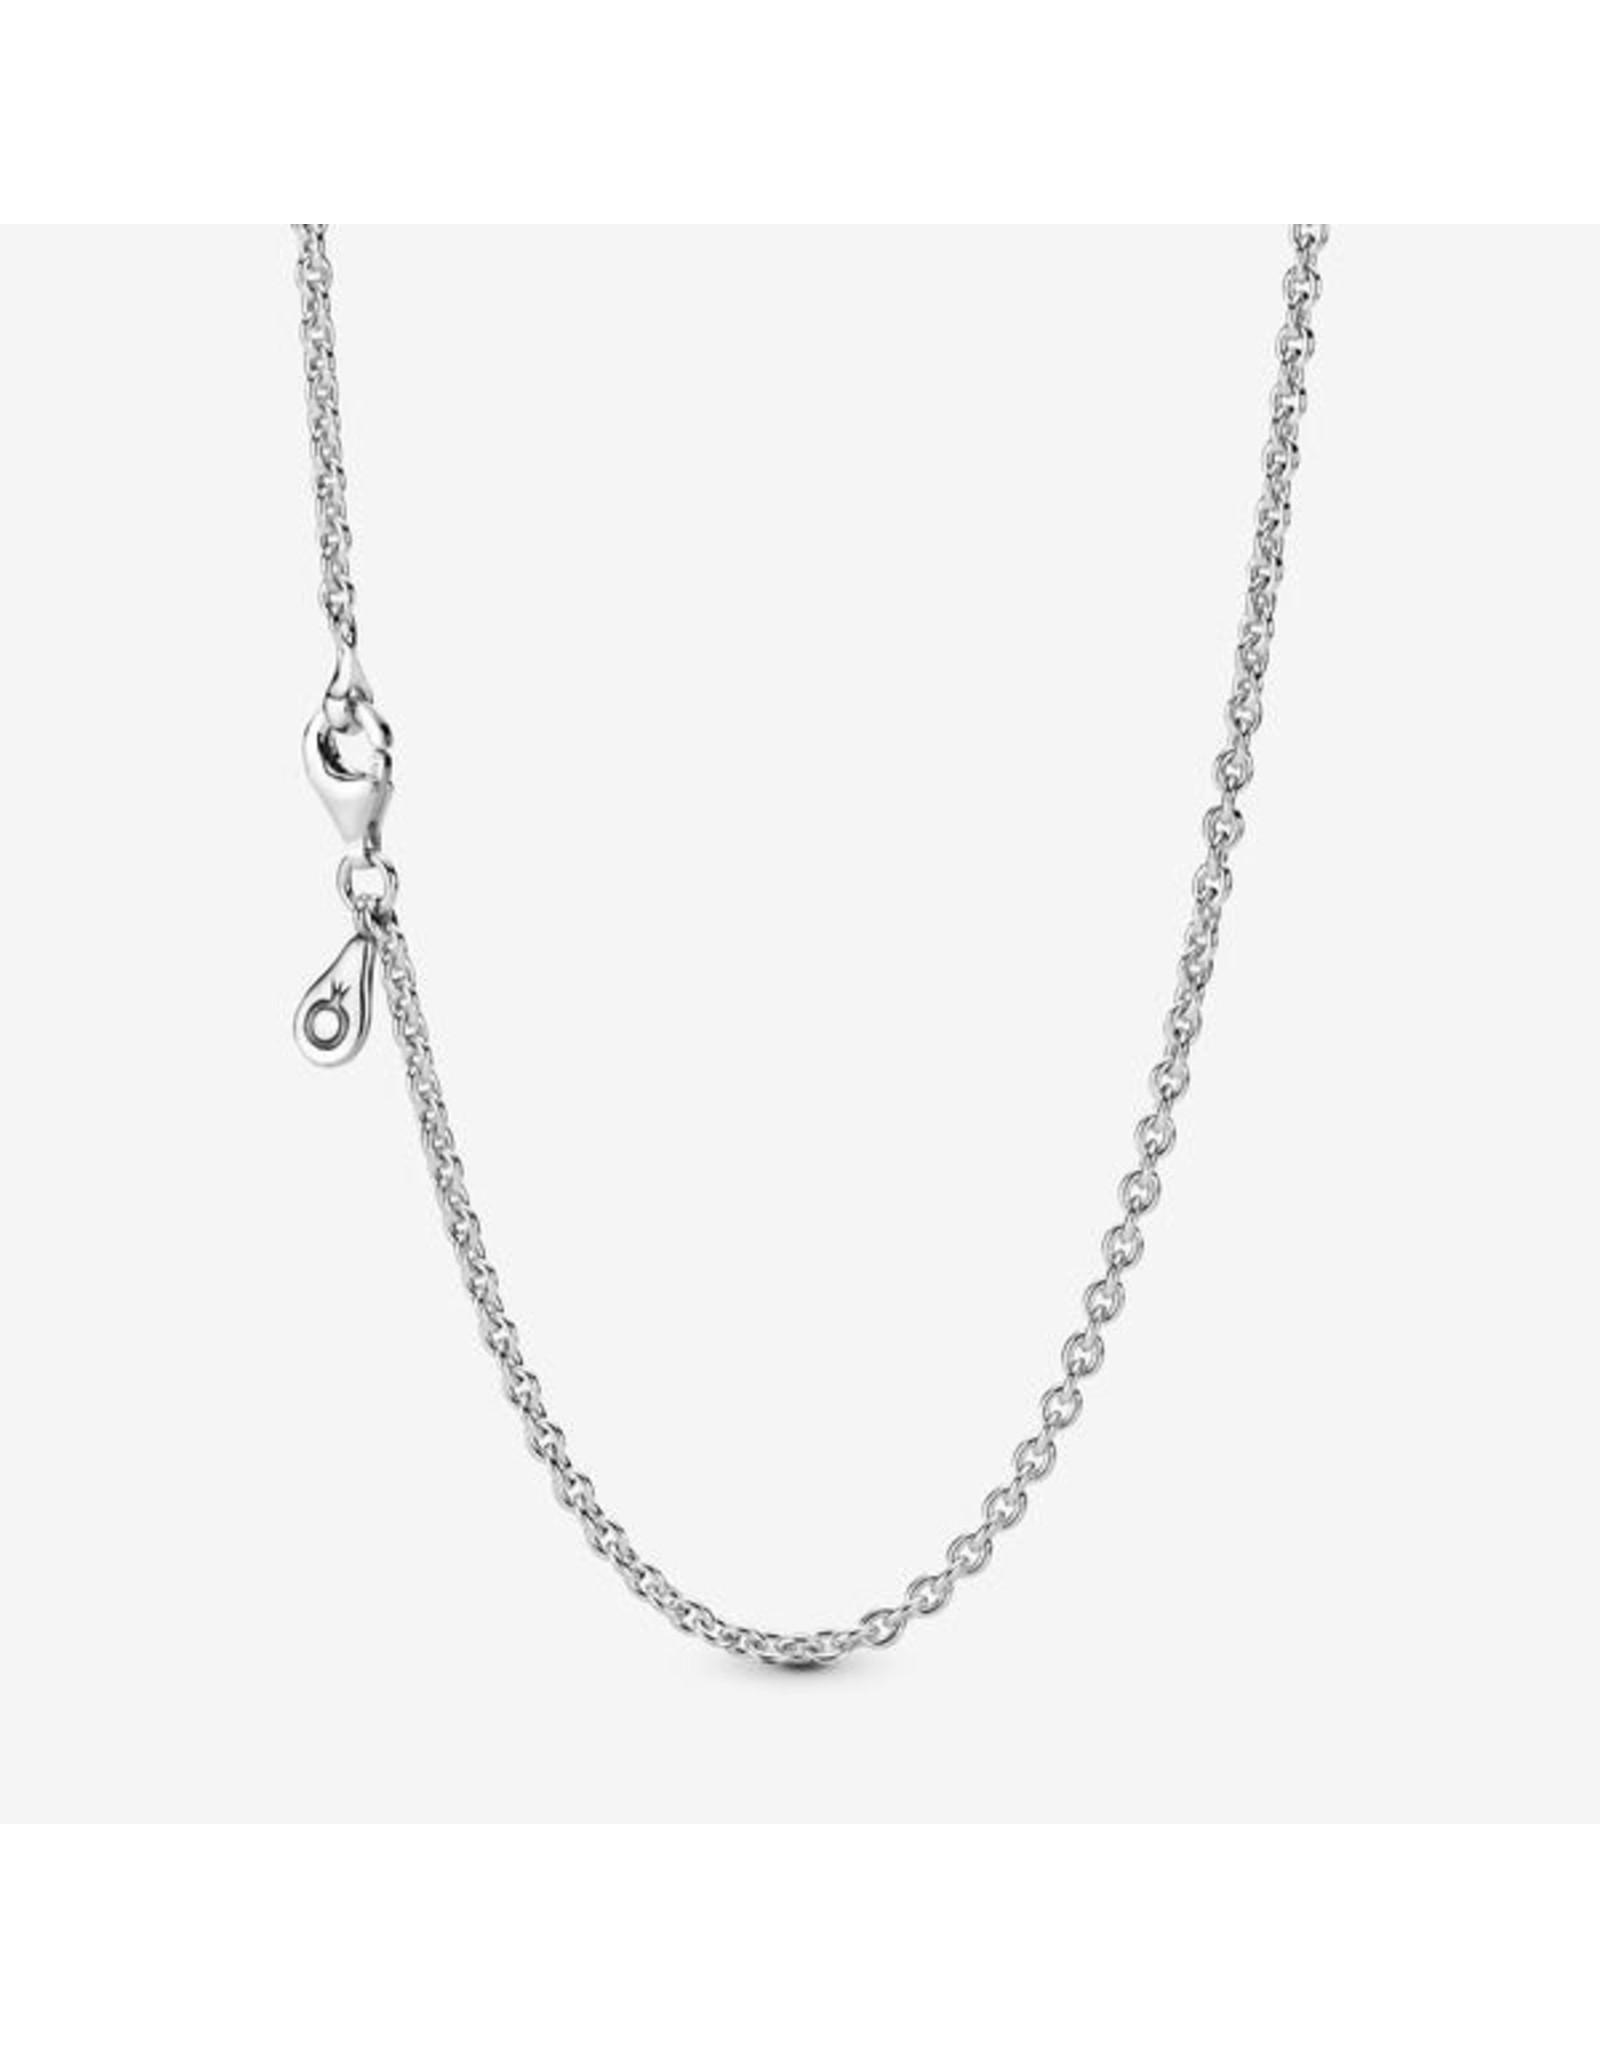 Pandora Pandora Chain, 590200-45,Silver,45cm